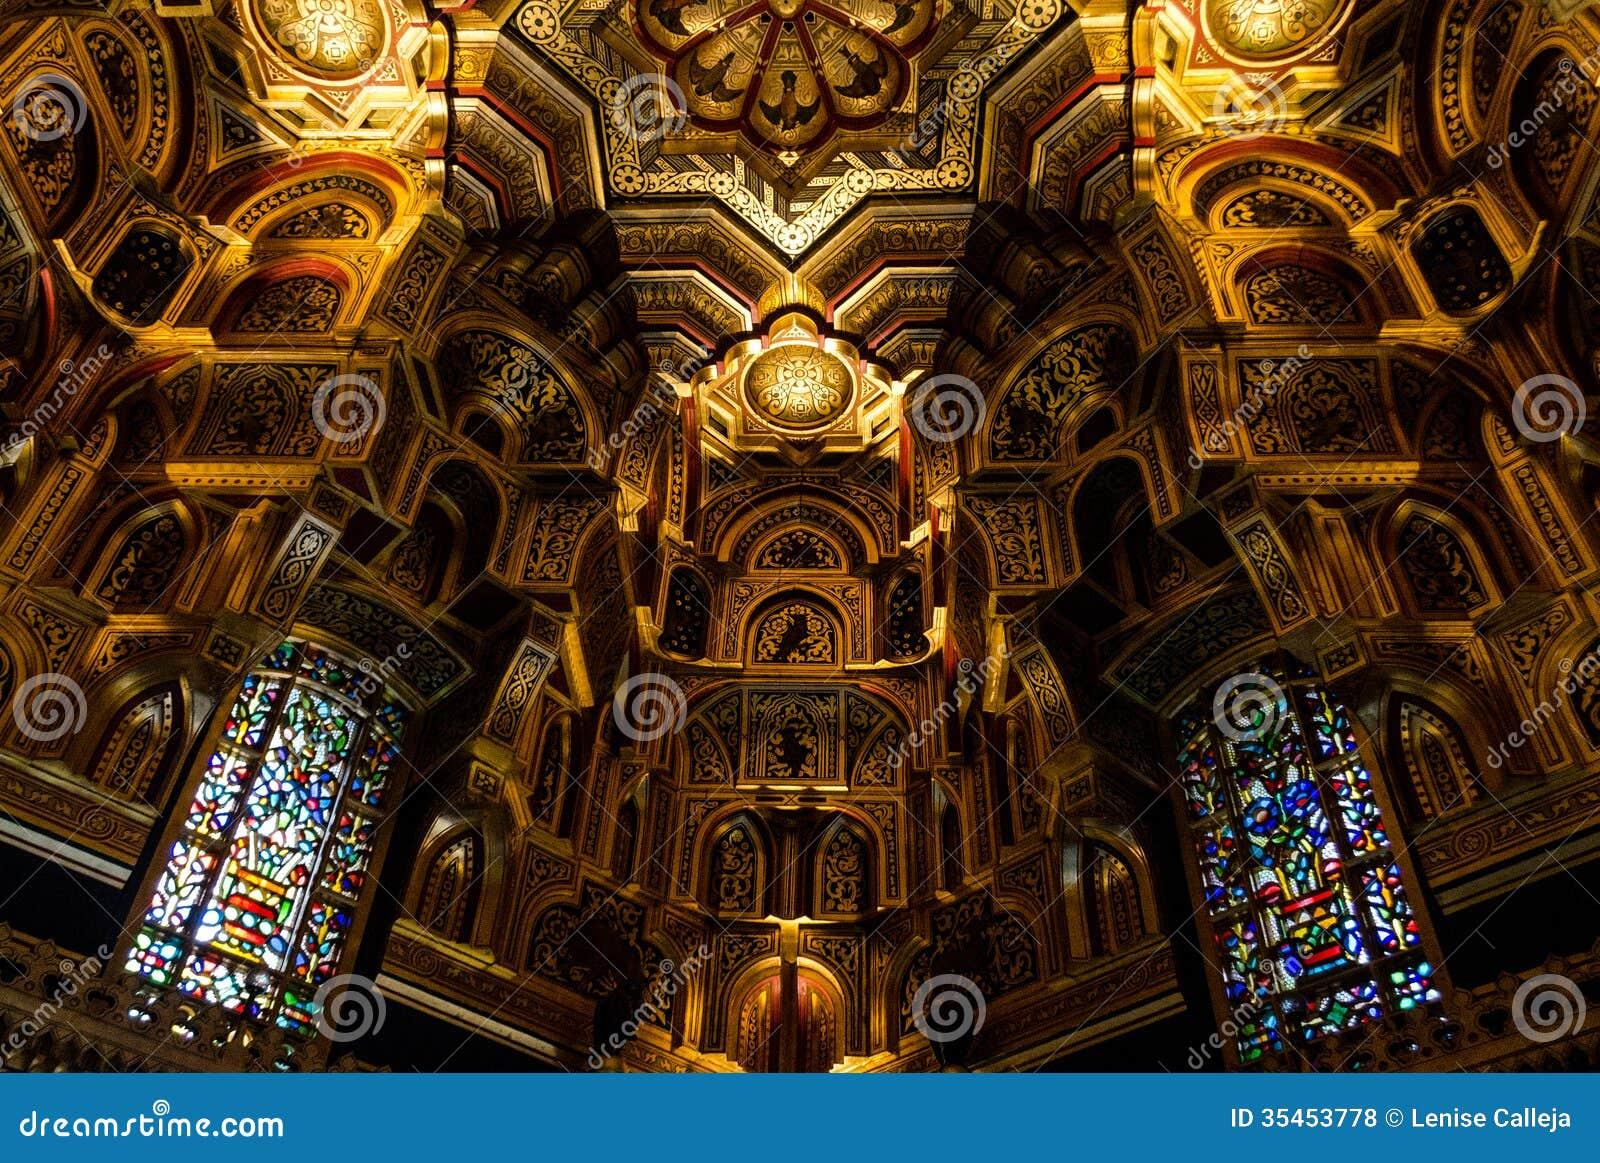 Interior of Cardiff Castle – Wales, United Kingdom